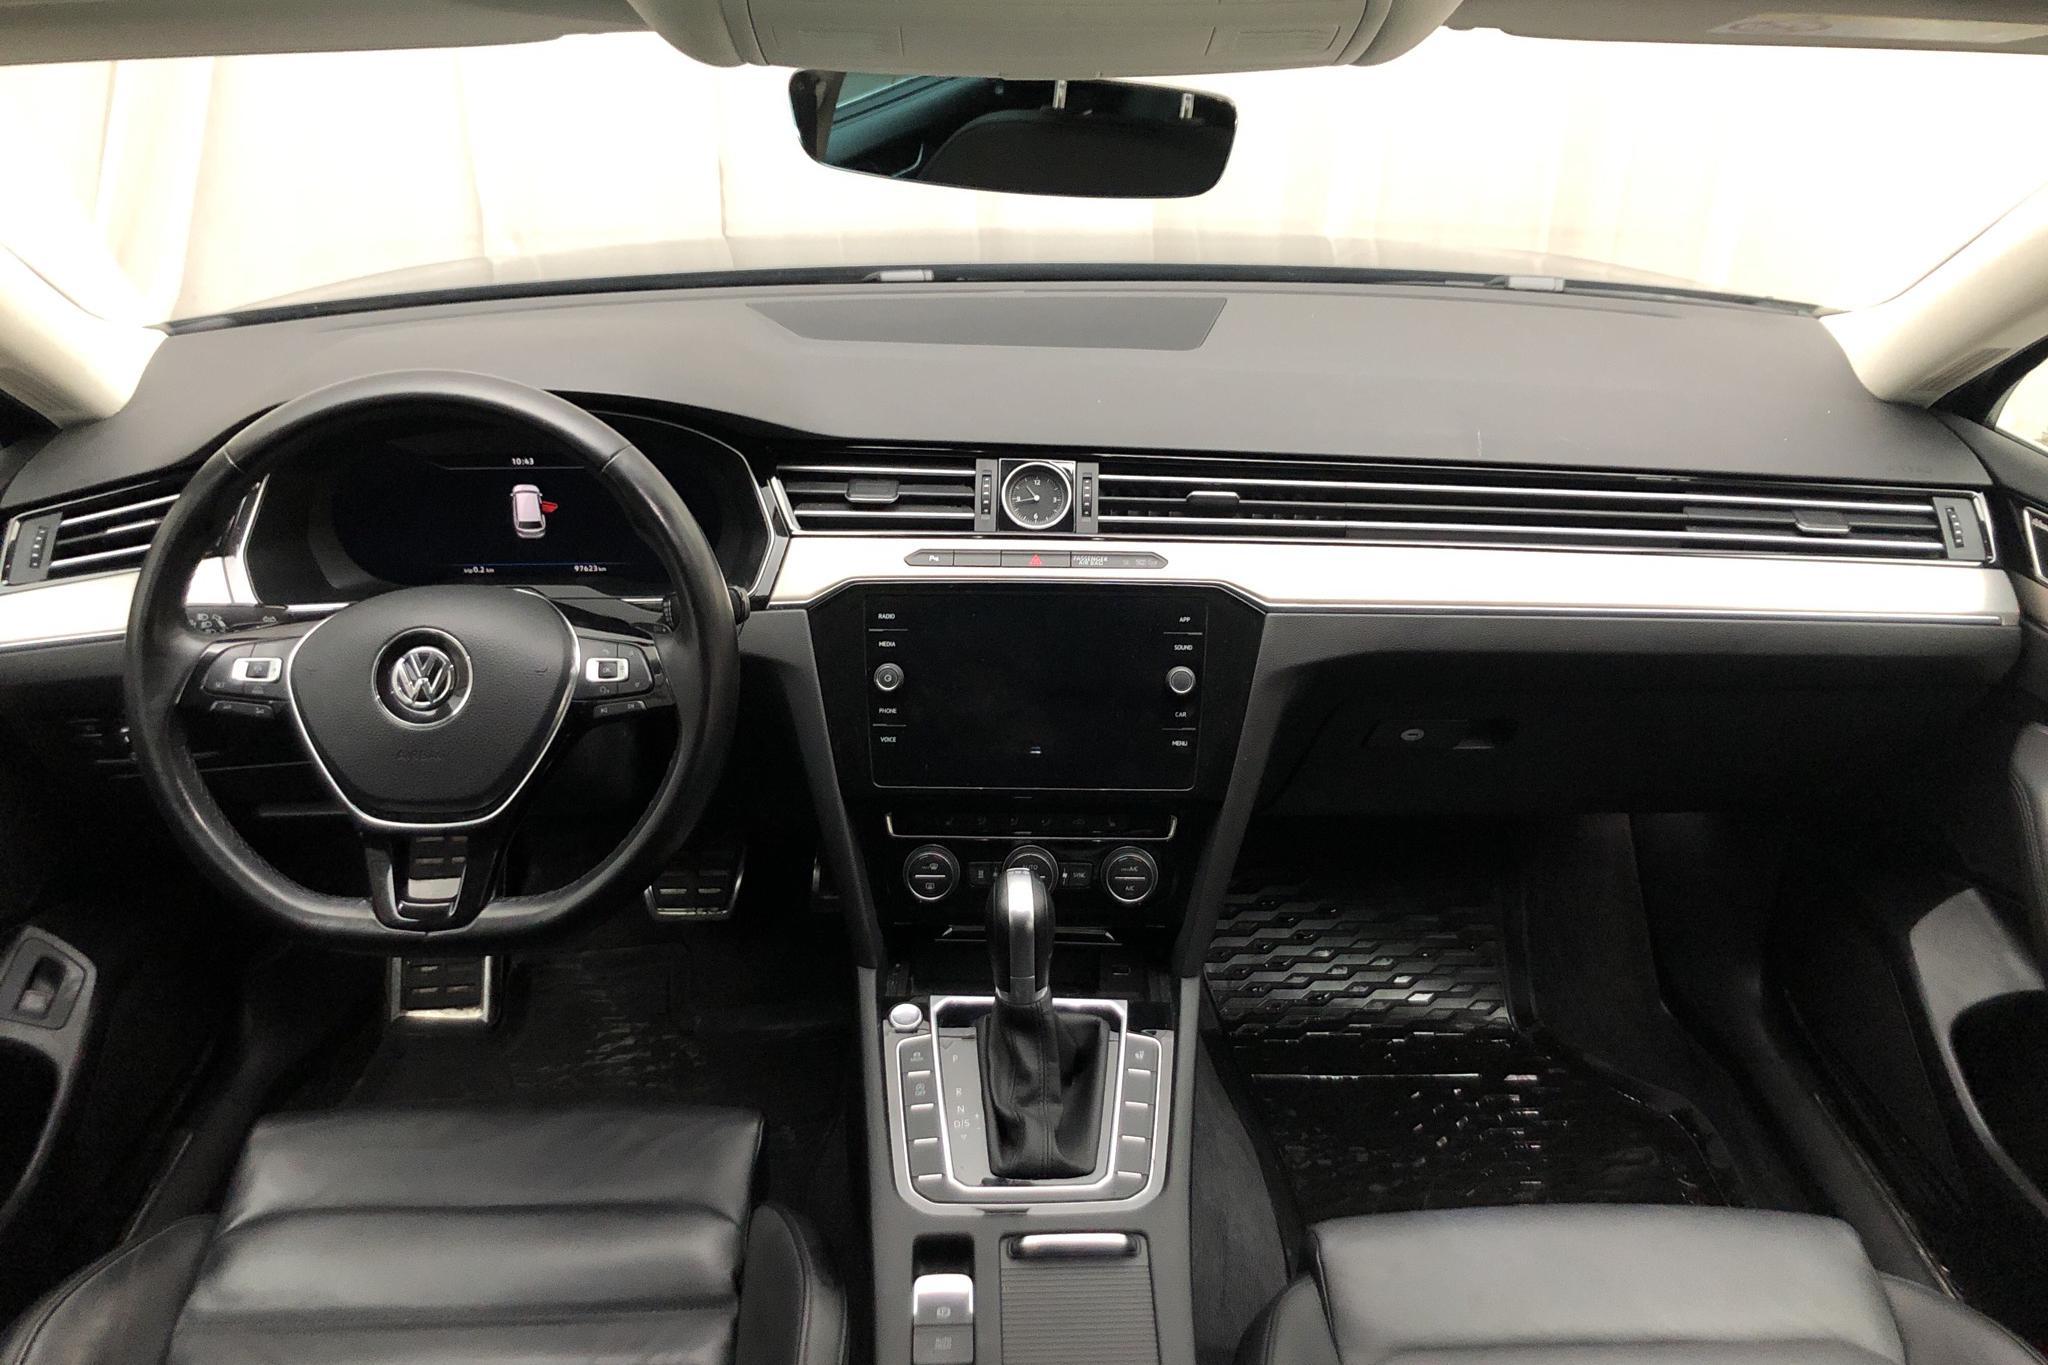 VW Passat Alltrack 2.0 TDI Sportscombi 4MOTION (190hk) - 97 620 km - Automatic - Dark Grey - 2018